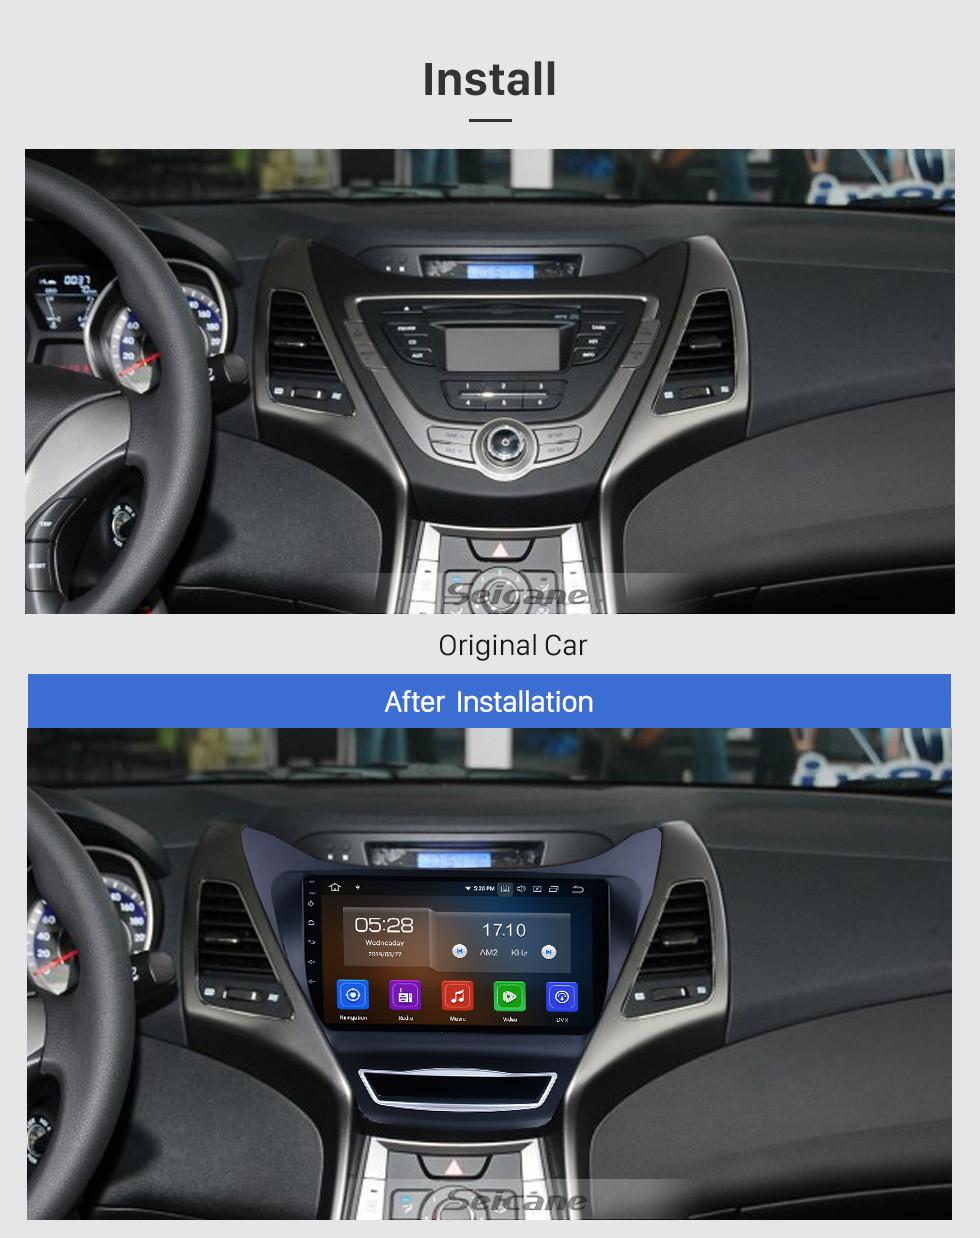 hight resolution of  oem 9 inch 2012 2013 hyundai elantra android 9 0 radio gps hyundai elantra hyundai wiring diagrams 2001